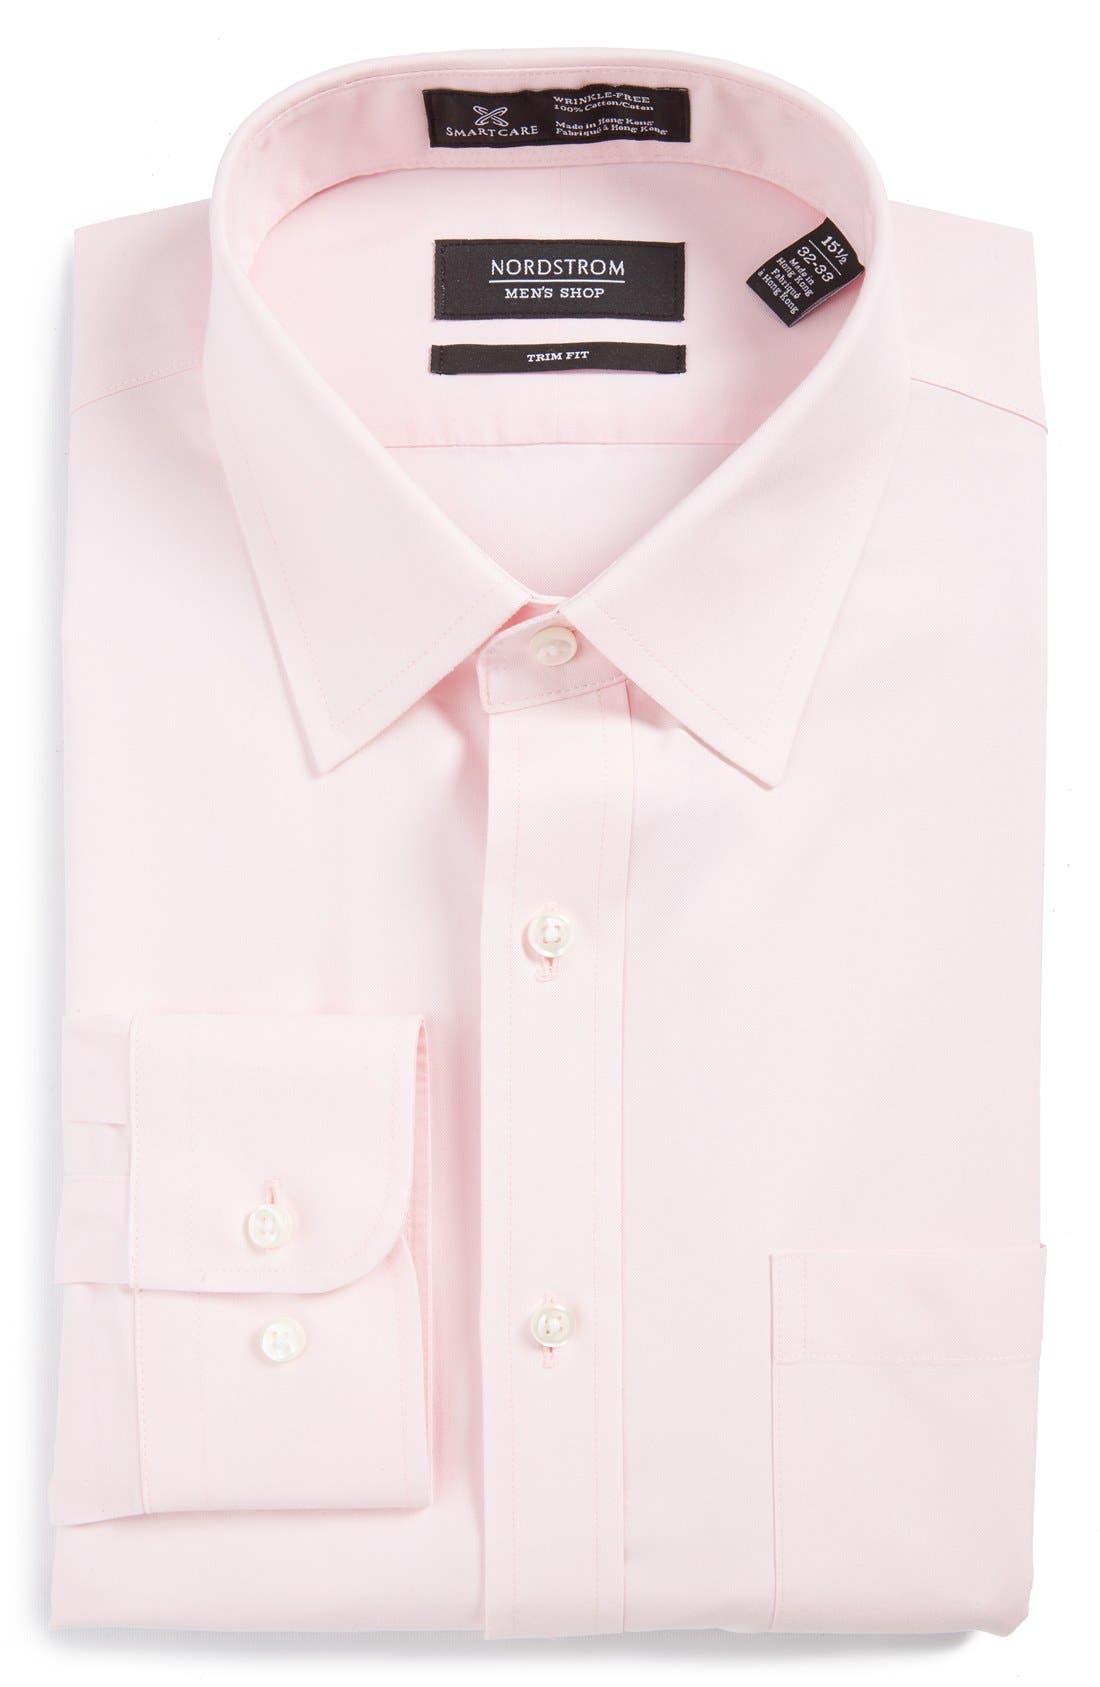 NORDSTROM MEN'S SHOP Smartcare™ Trim Fit Solid Dress